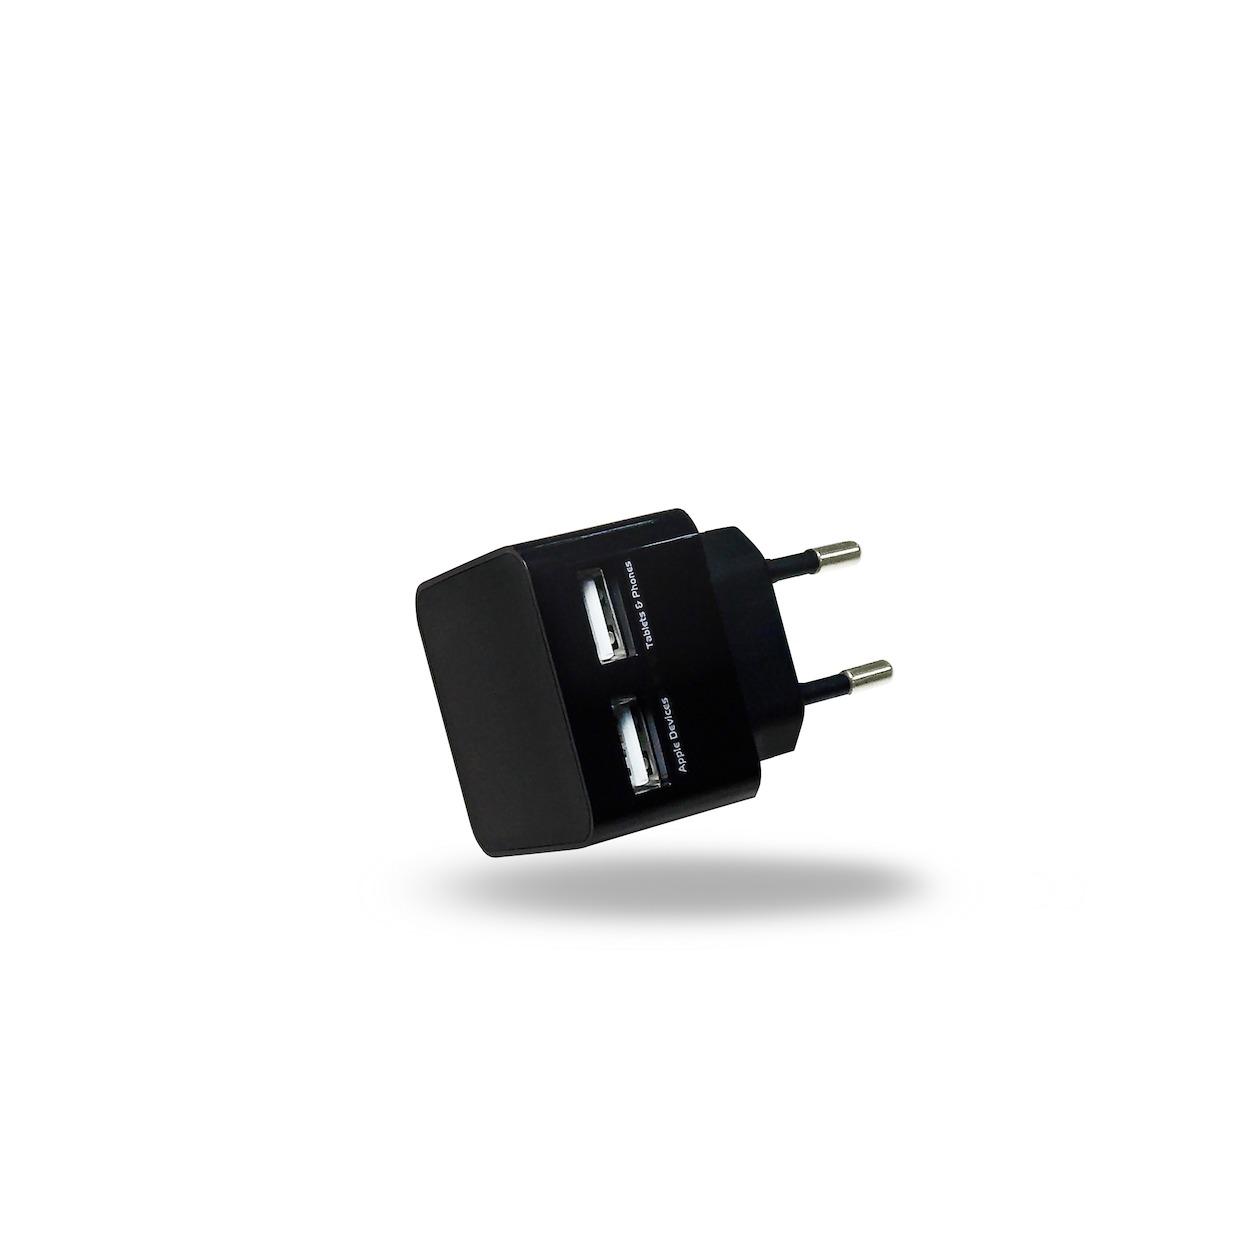 Afbeelding van Azuri oplader Thuislader 2 x USB-adapter zwart